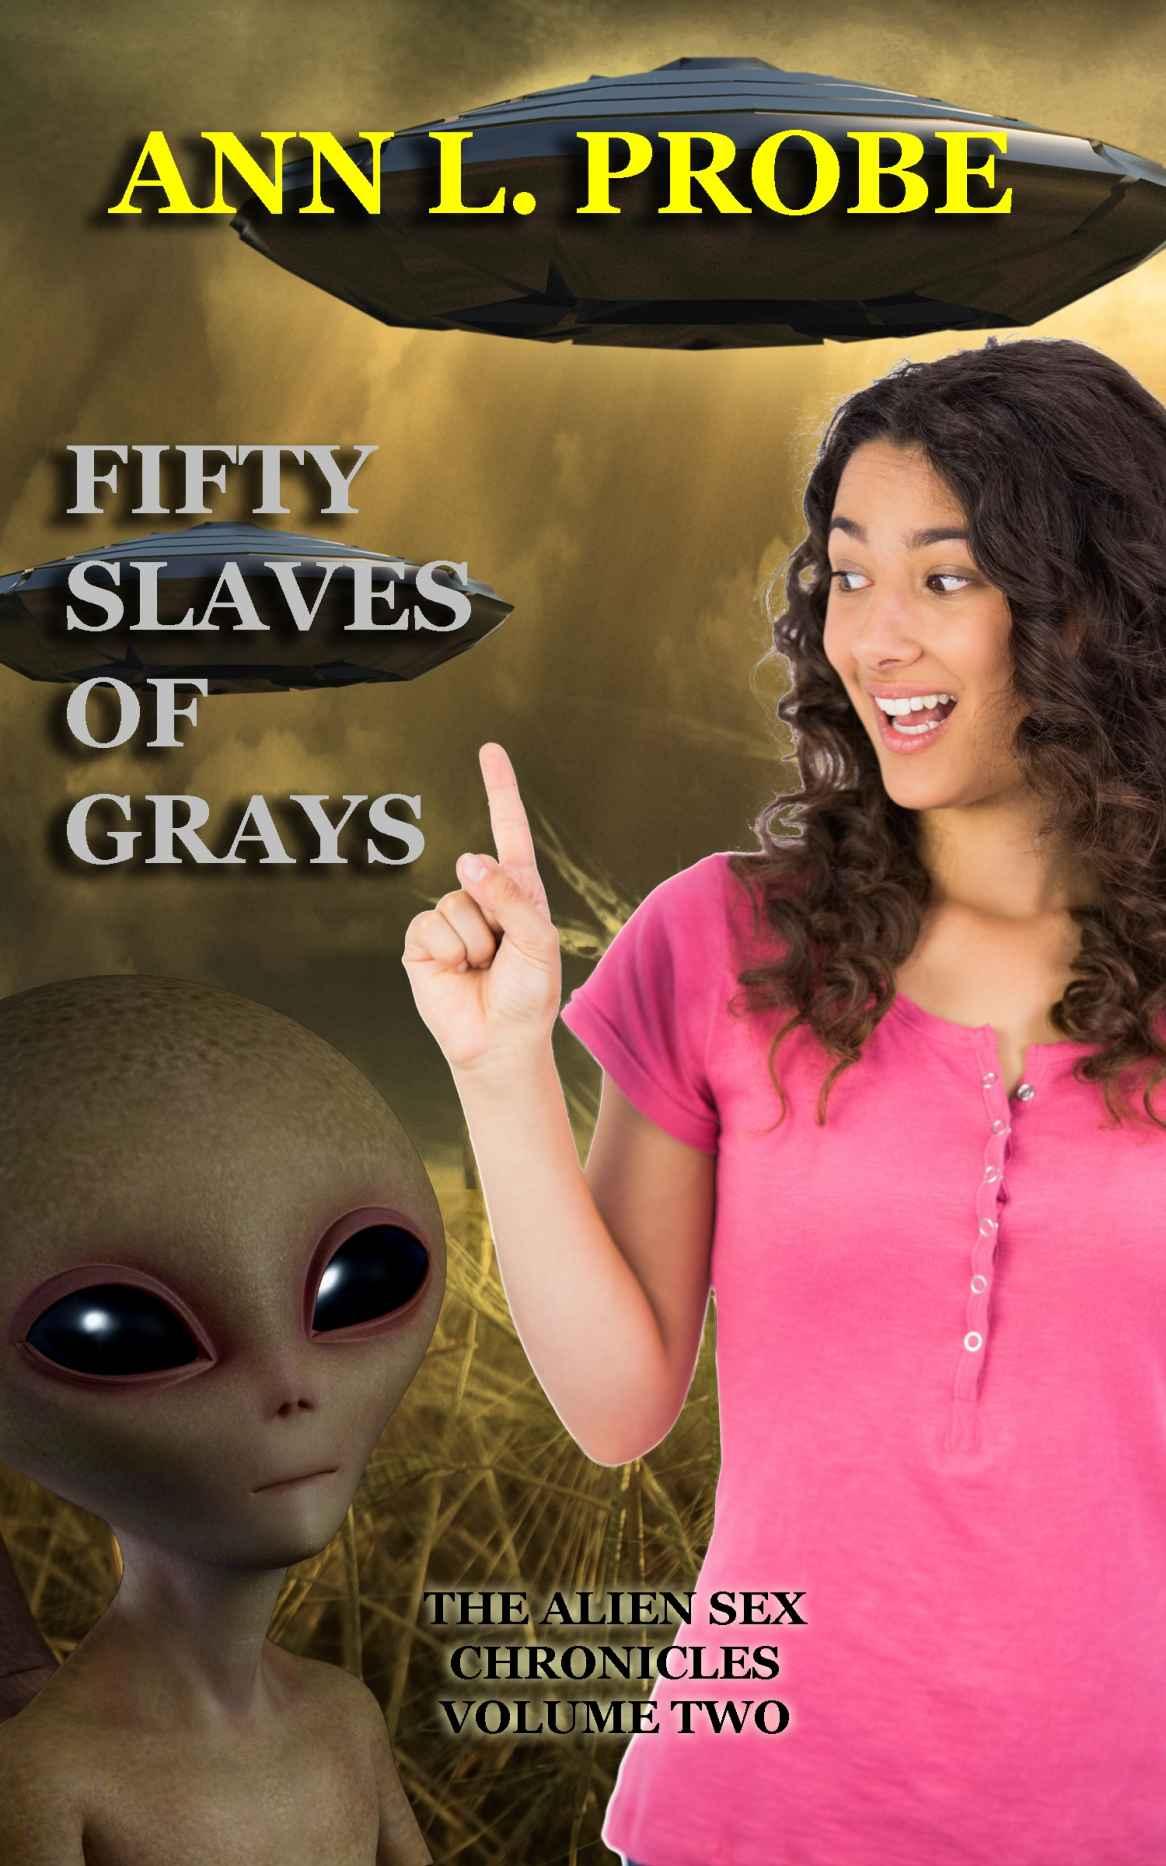 fifty slaves of gray ann l. probe